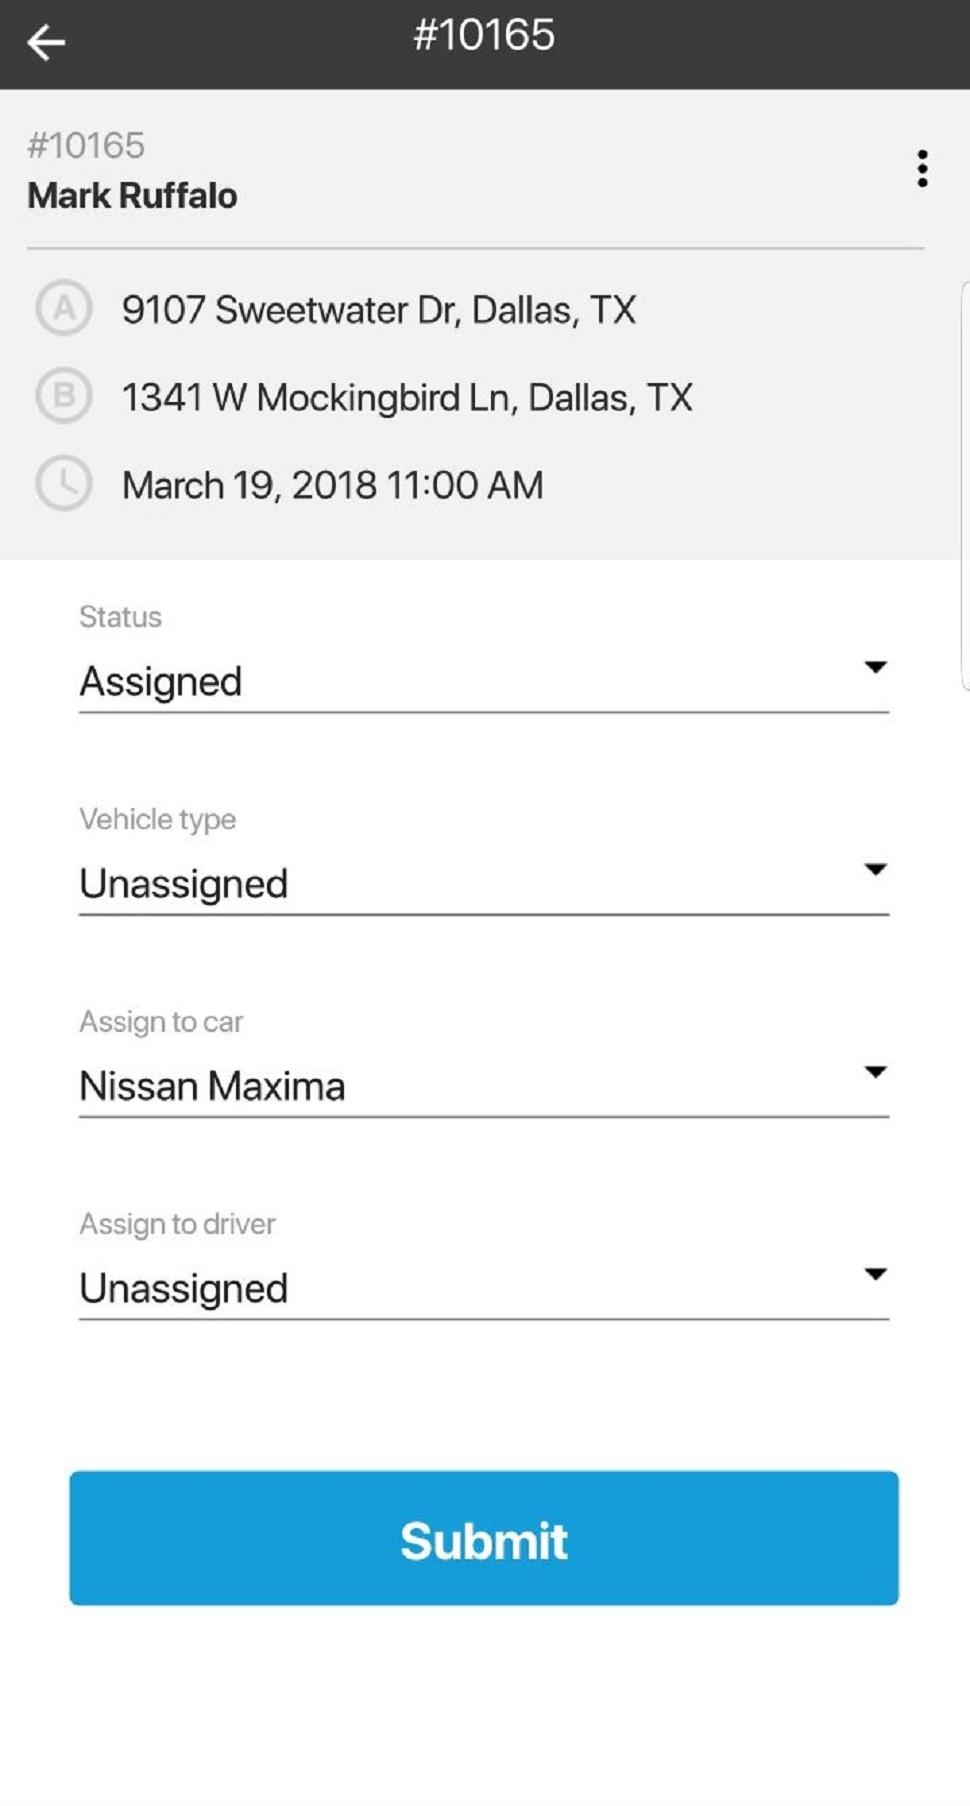 Mobile driver information